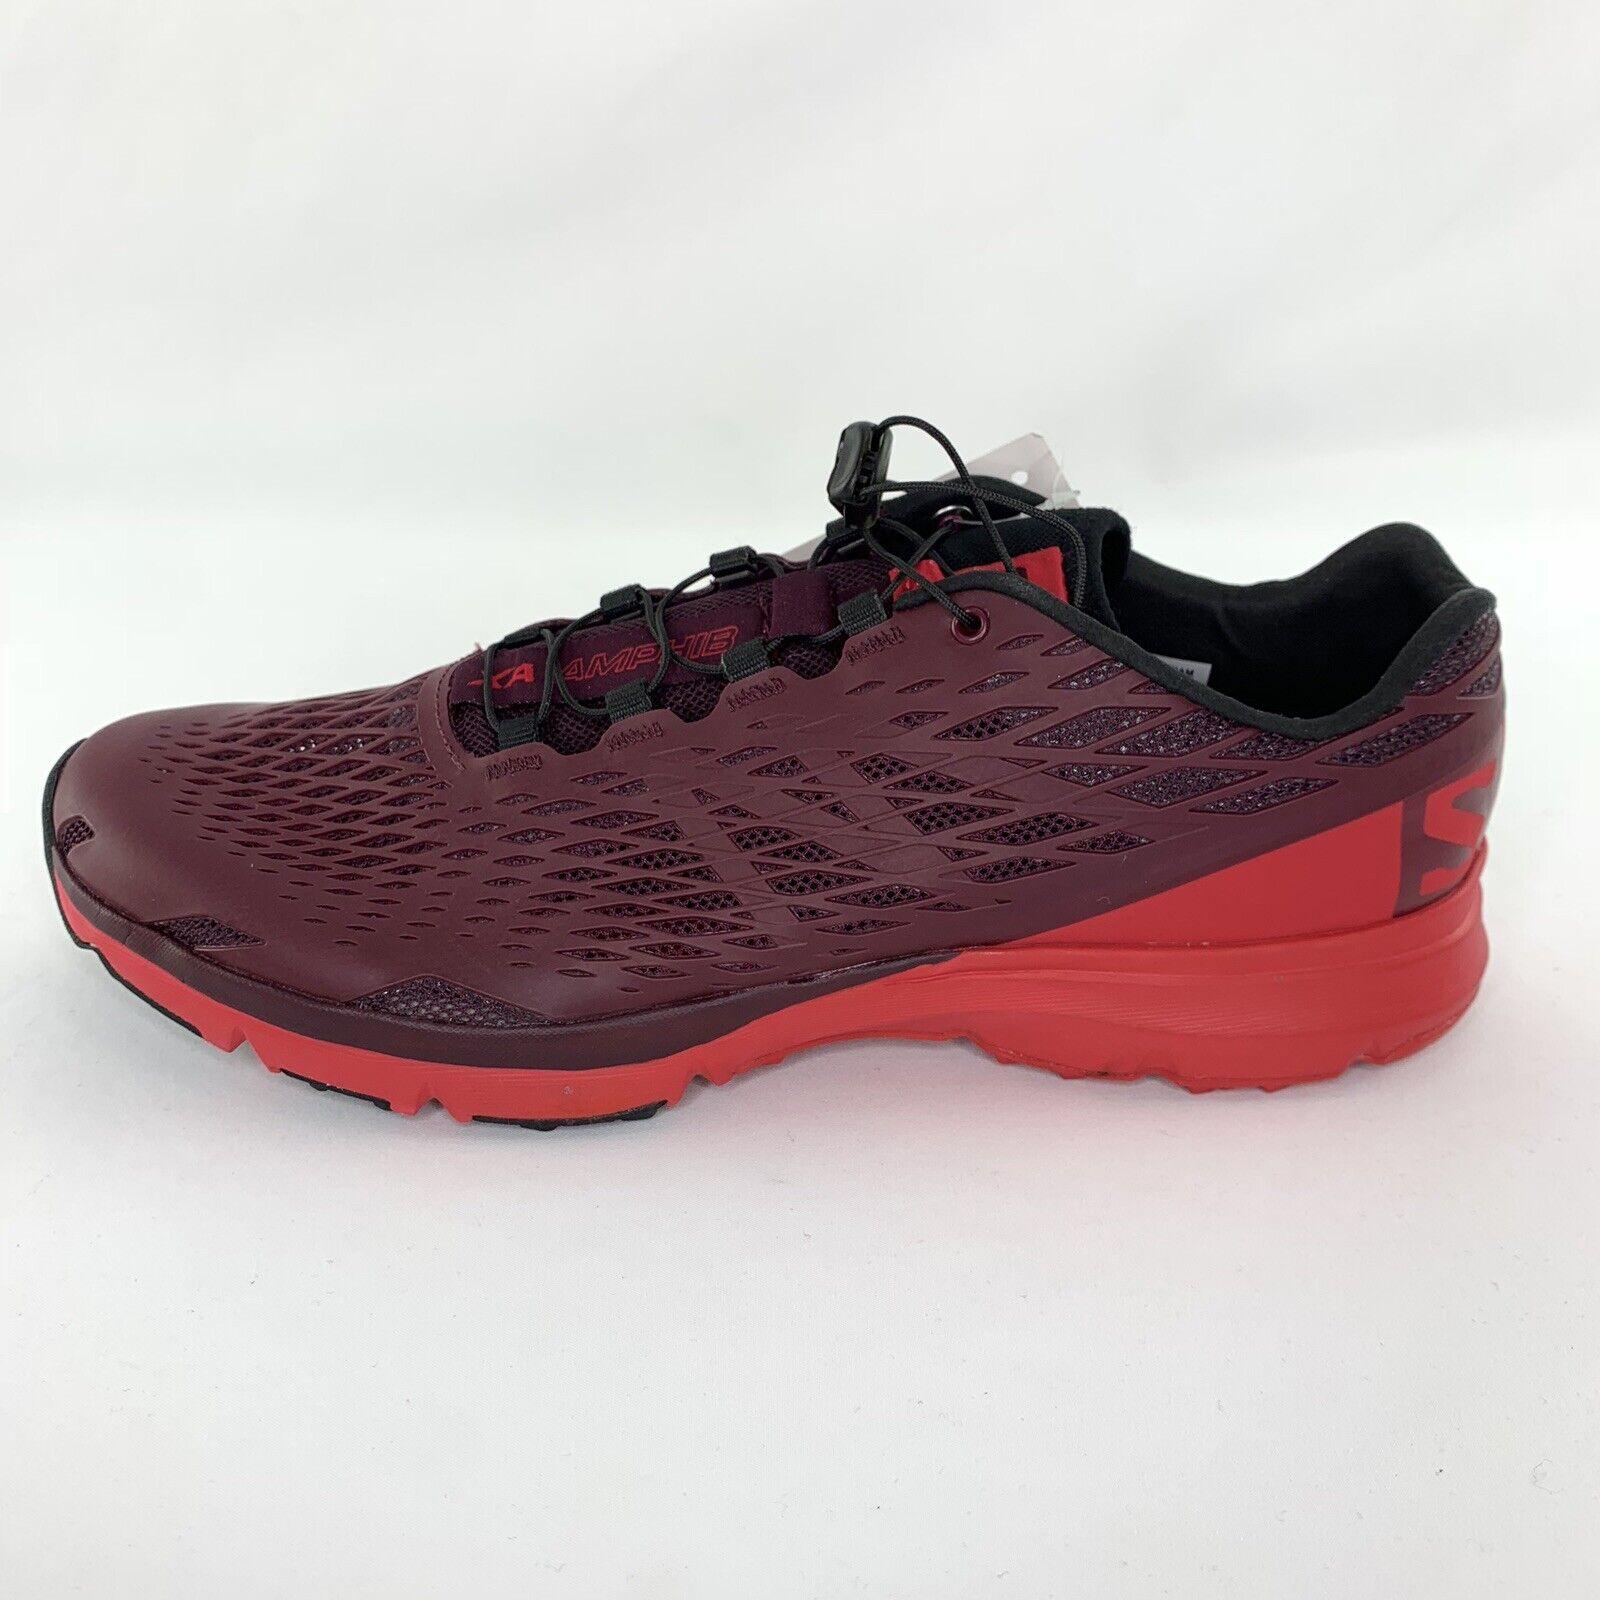 Salomon Women's XA Amphib W Trail Running shoes Sz 10